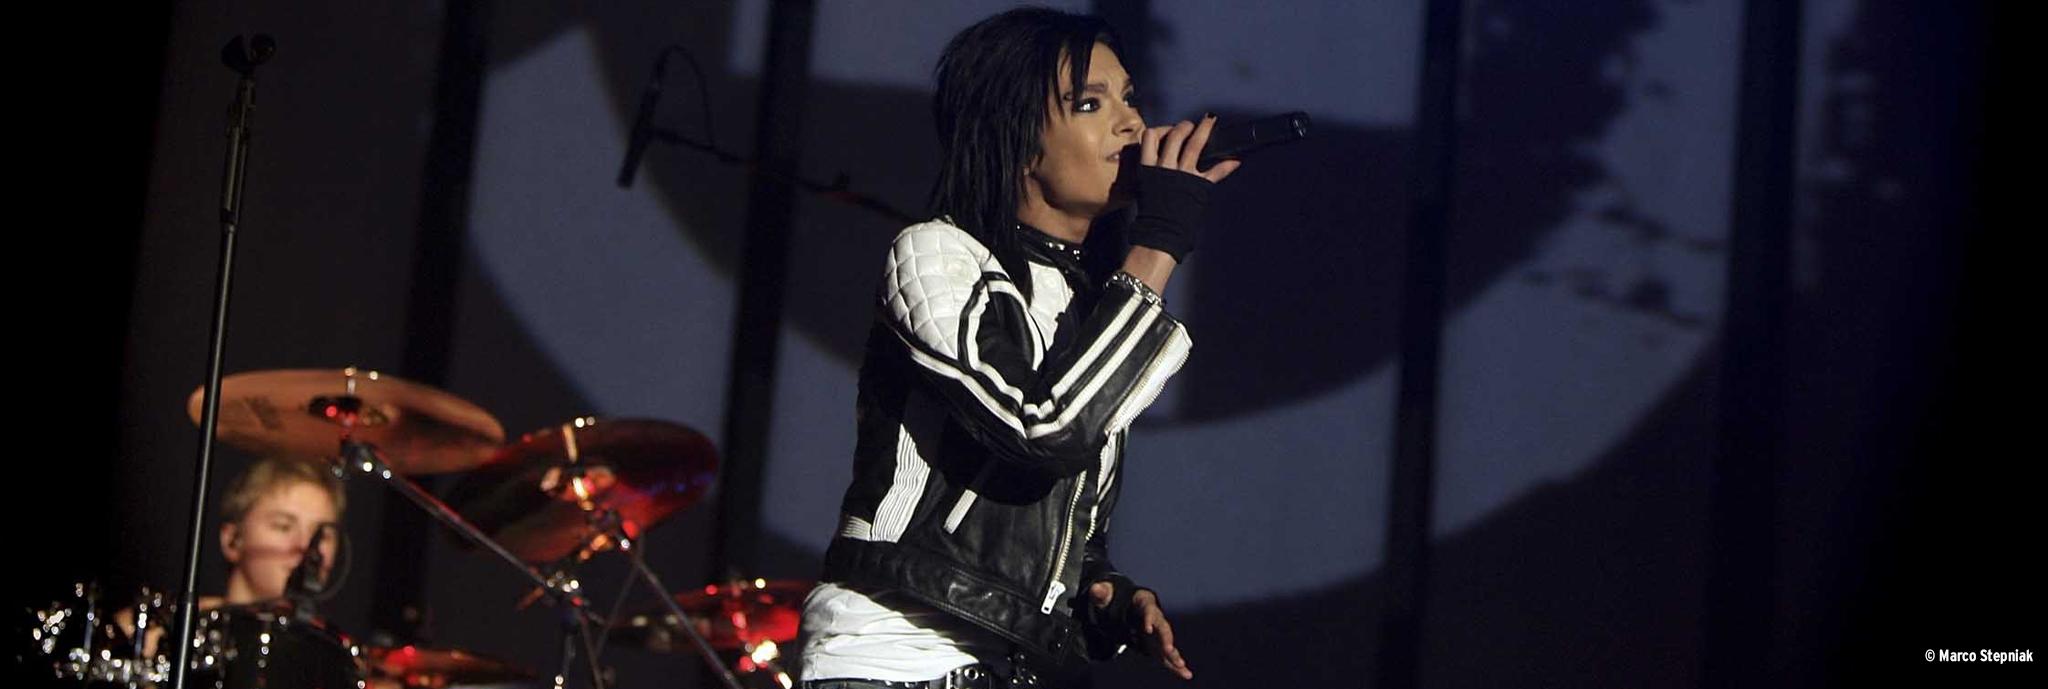 2006 - Tokio Hotel